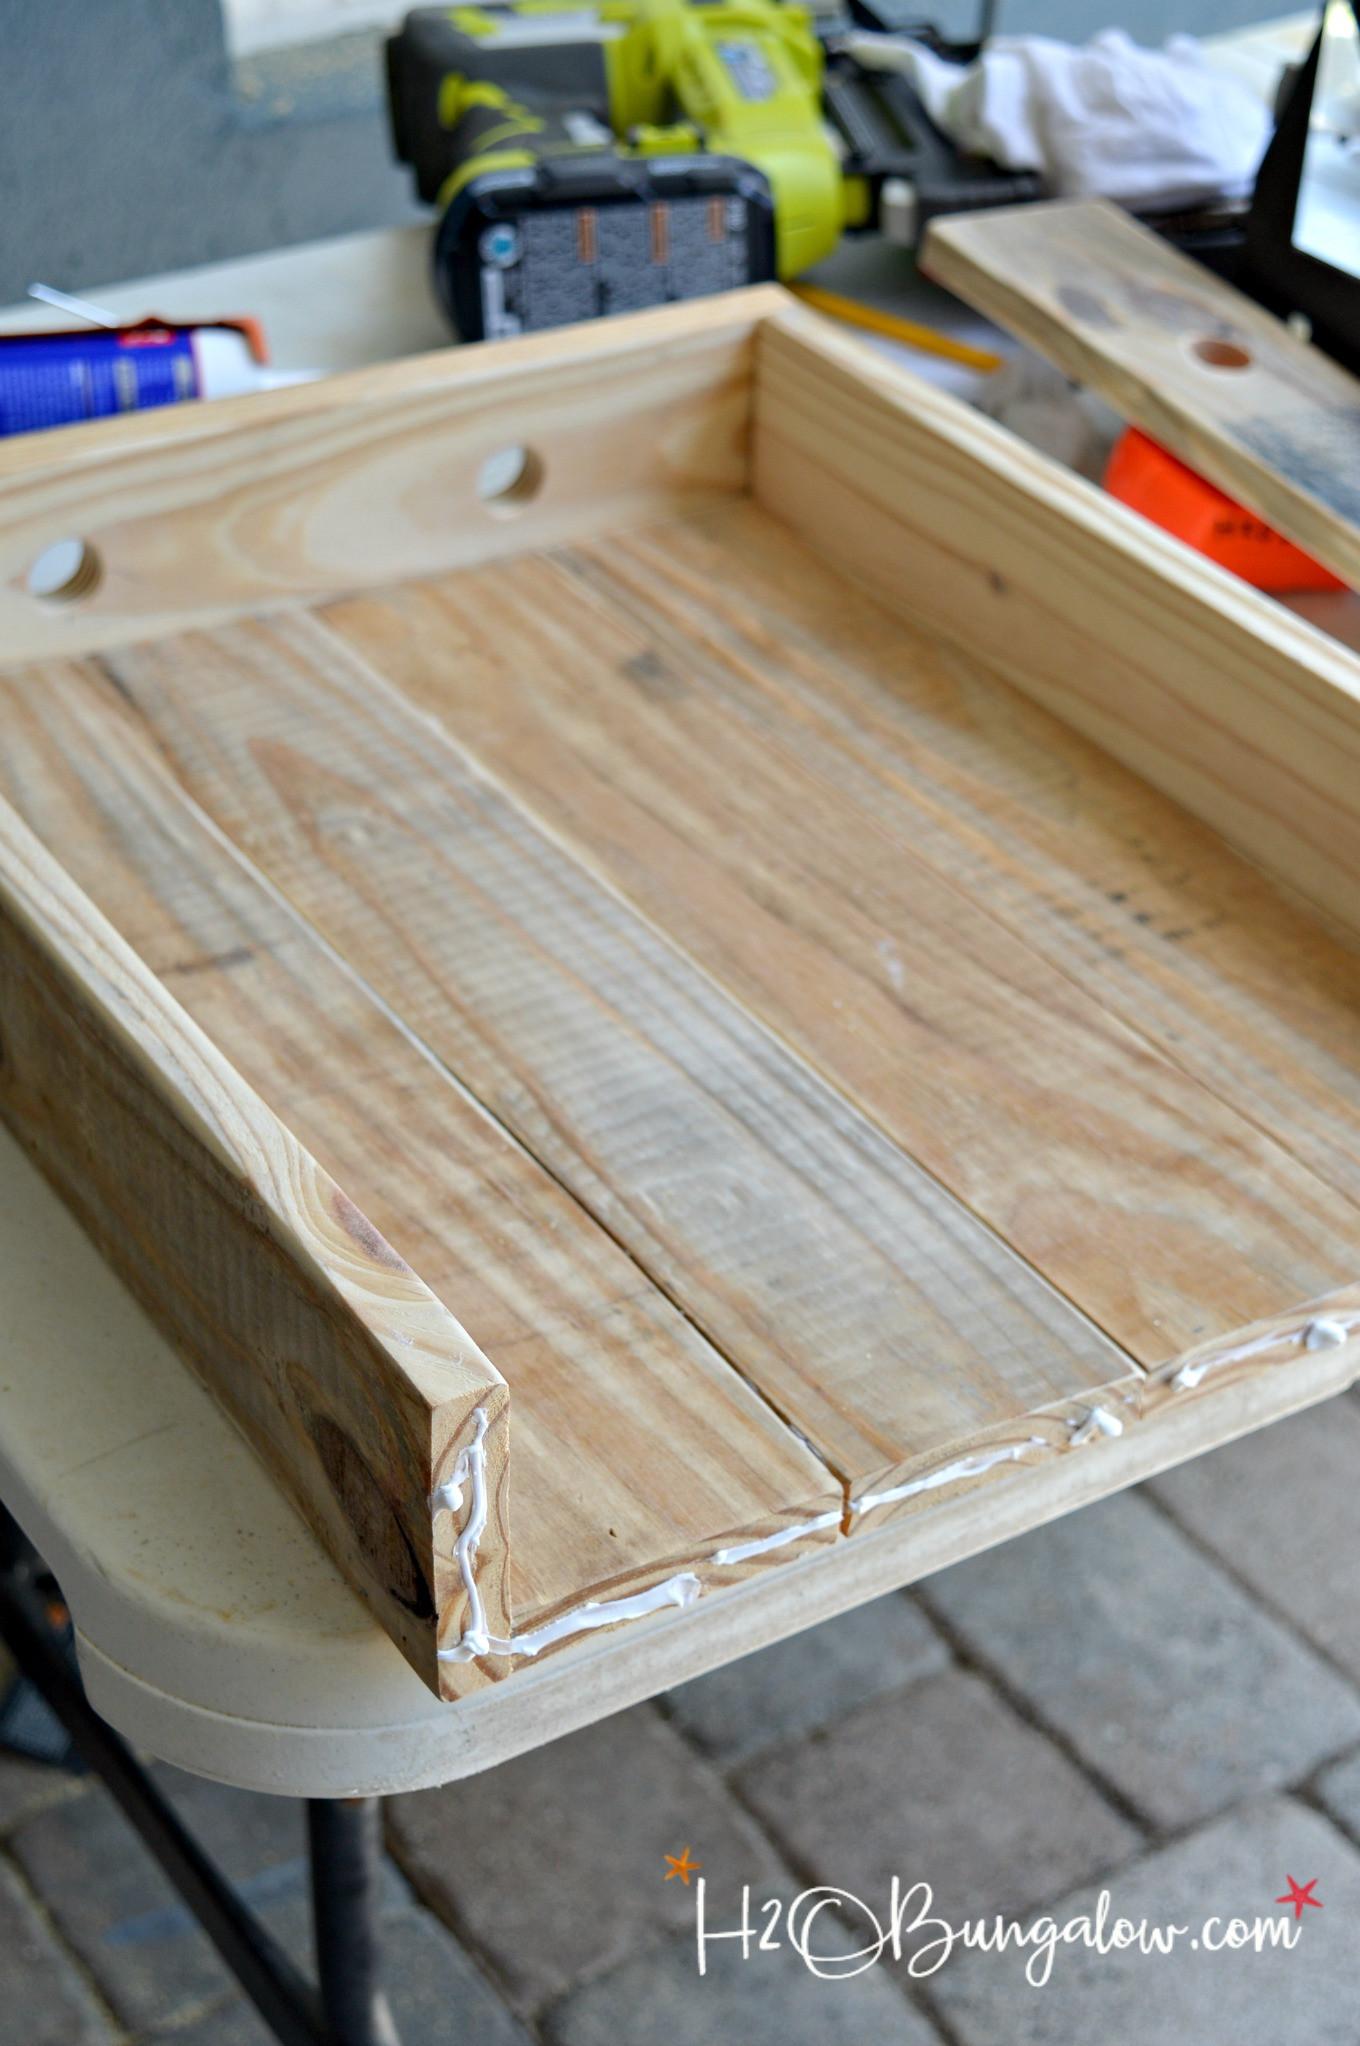 DIY Wood Serving Tray  DIY Coastal Rope Handle Tray Tutorial H20Bungalow